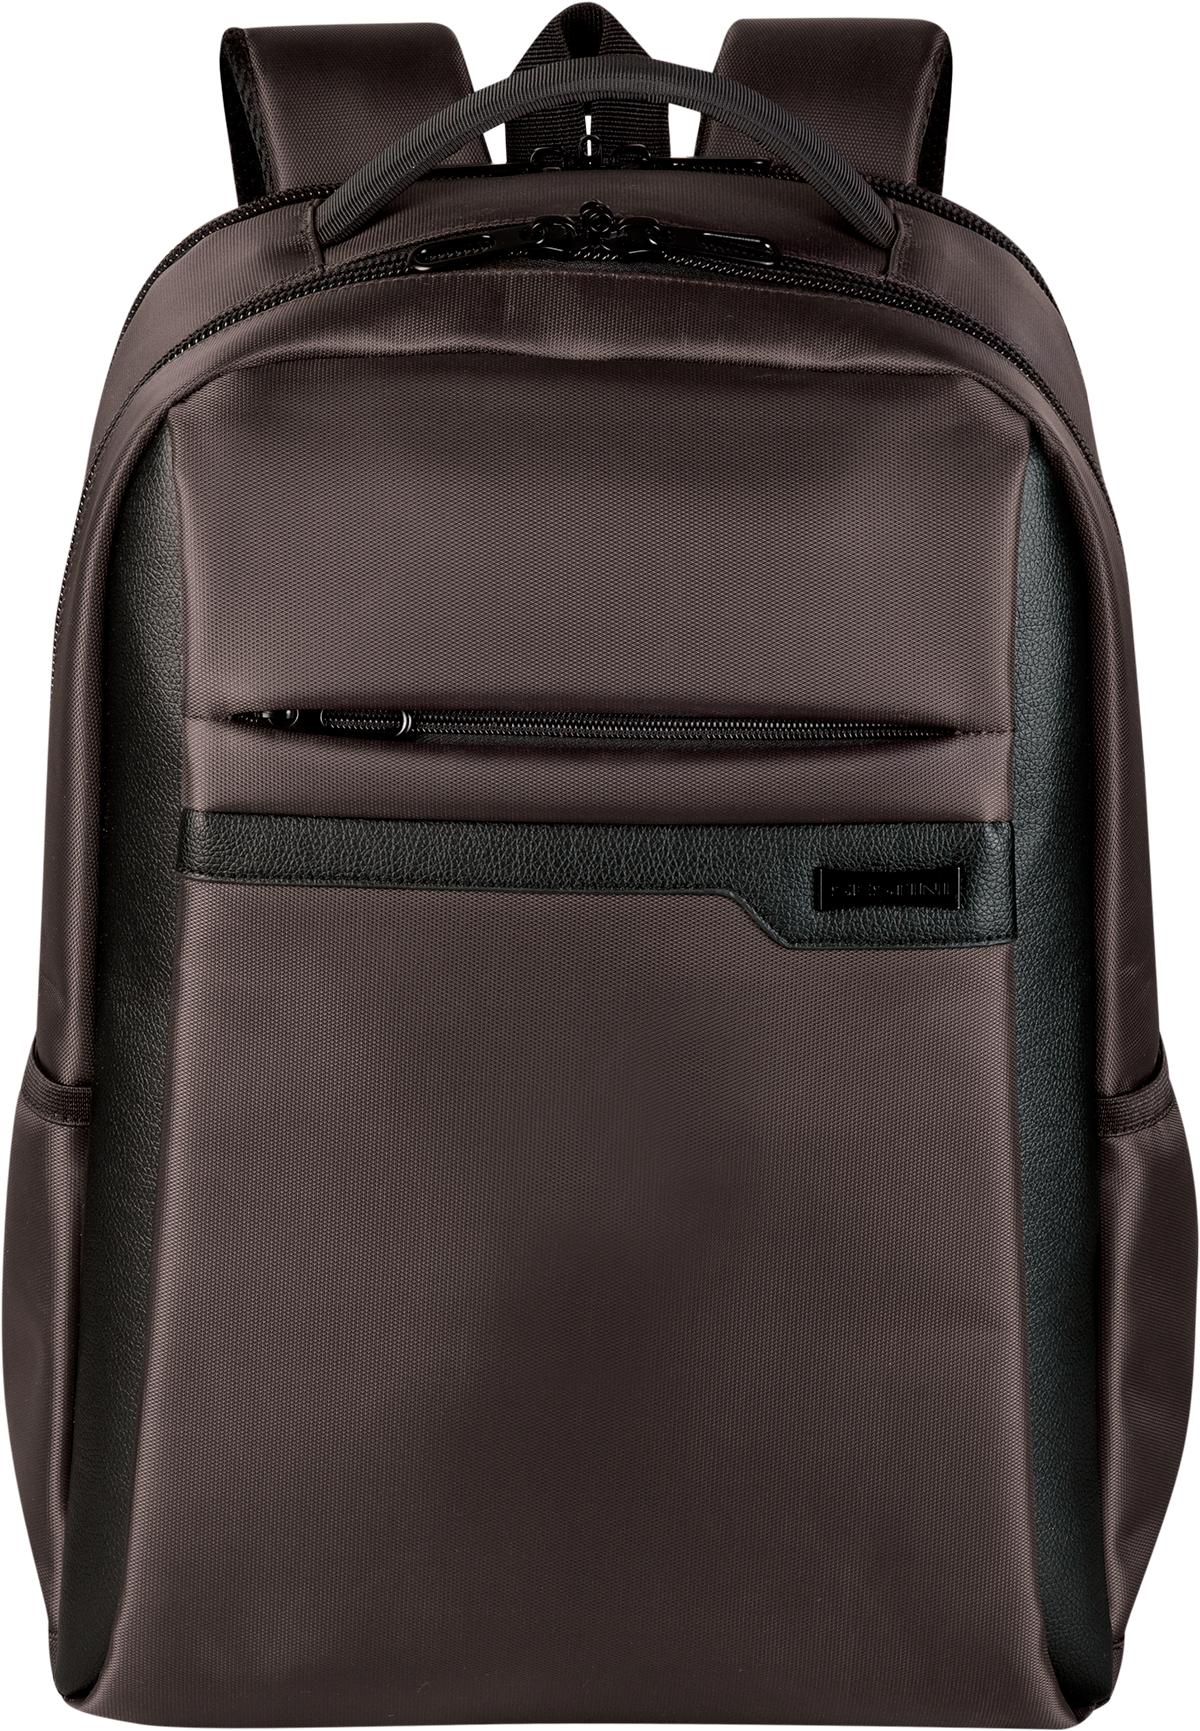 Mochila Grande 2 Compartimentos Laptop Sestini Prime Marrom